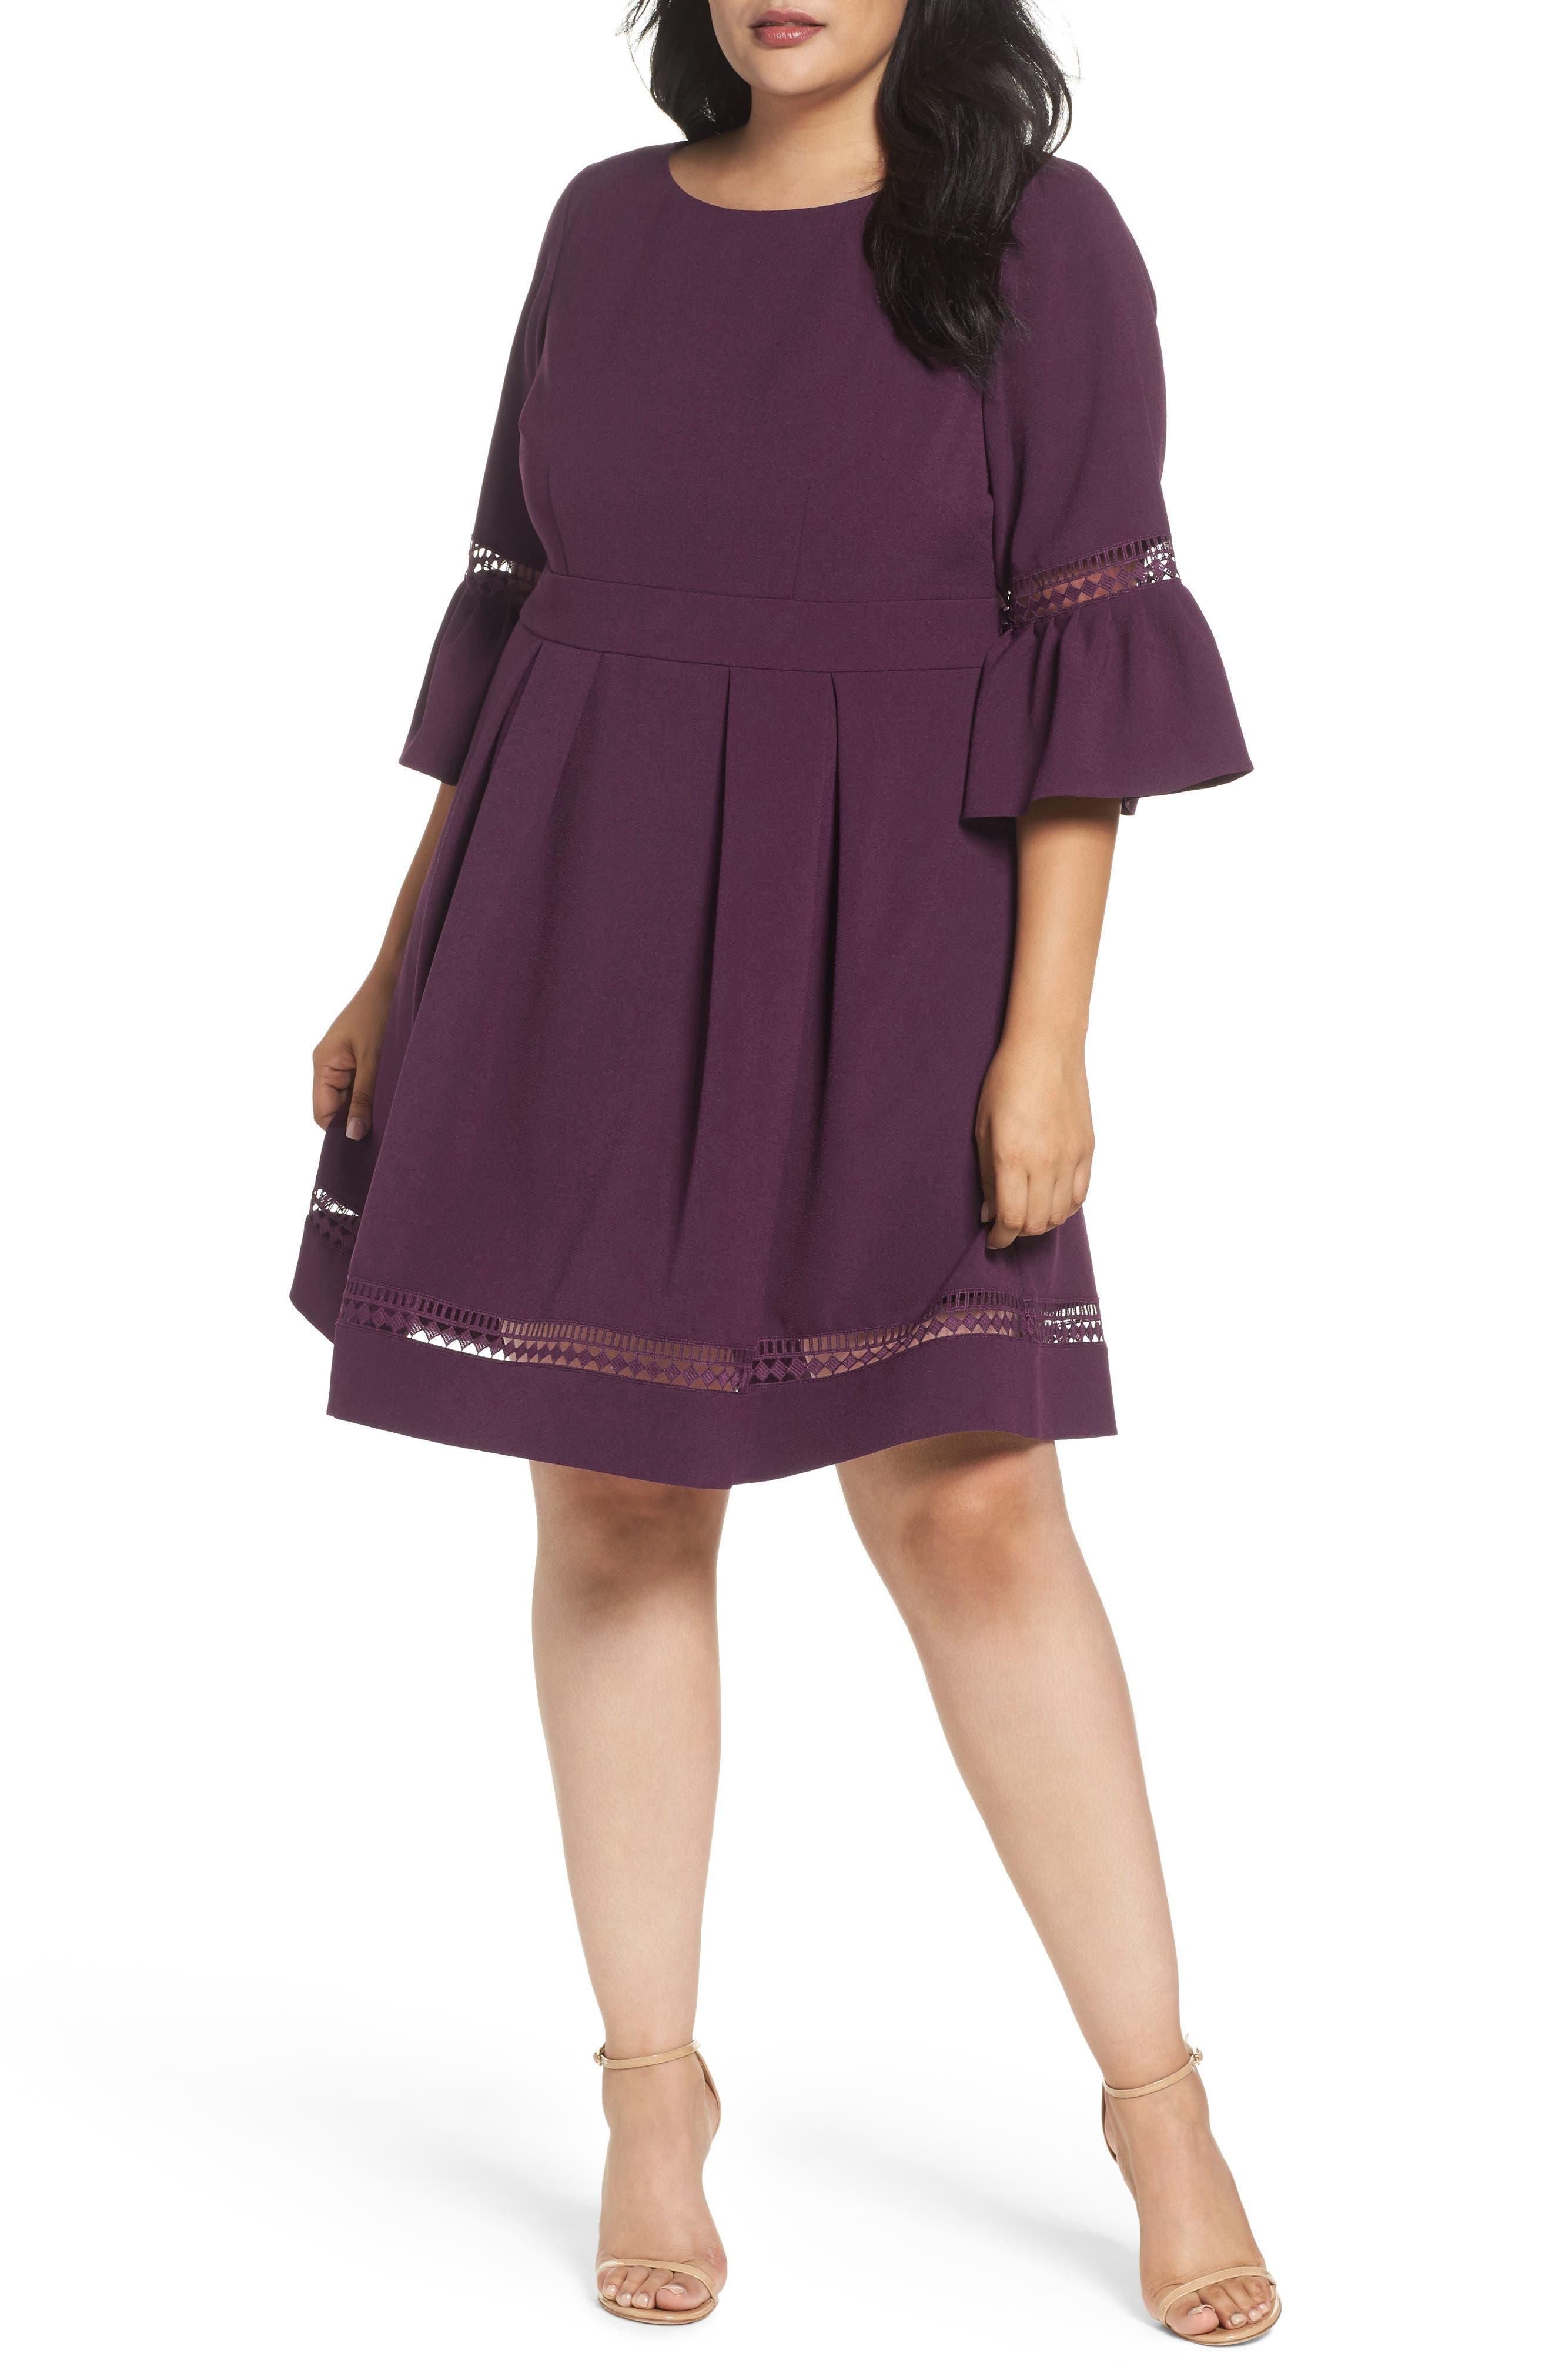 Alternate Image 1 Selected - Eliza J Bell Sleeve Fit & Flare Dress (Plus Size)